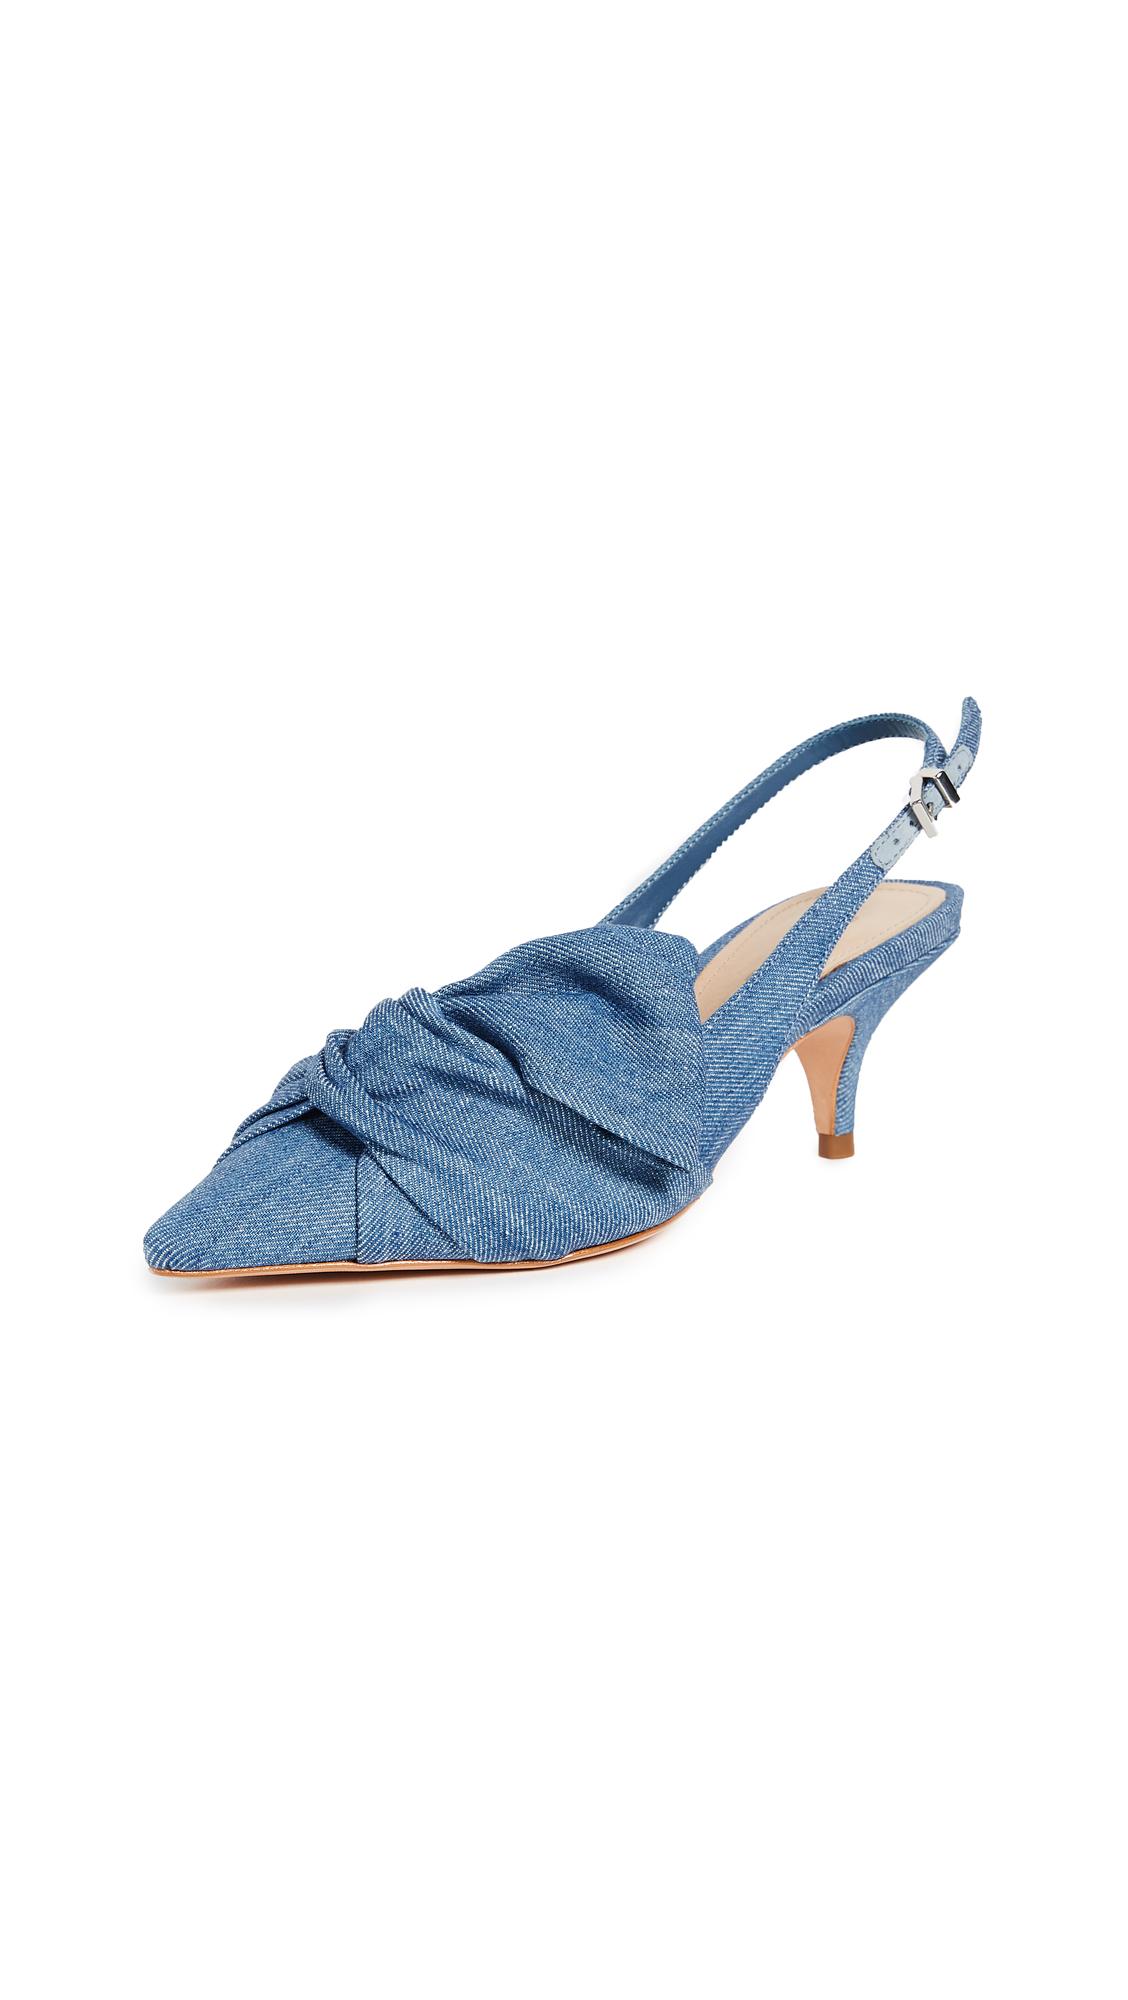 Schutz Hirata Kitten Heel Slingbacks - Light Blue